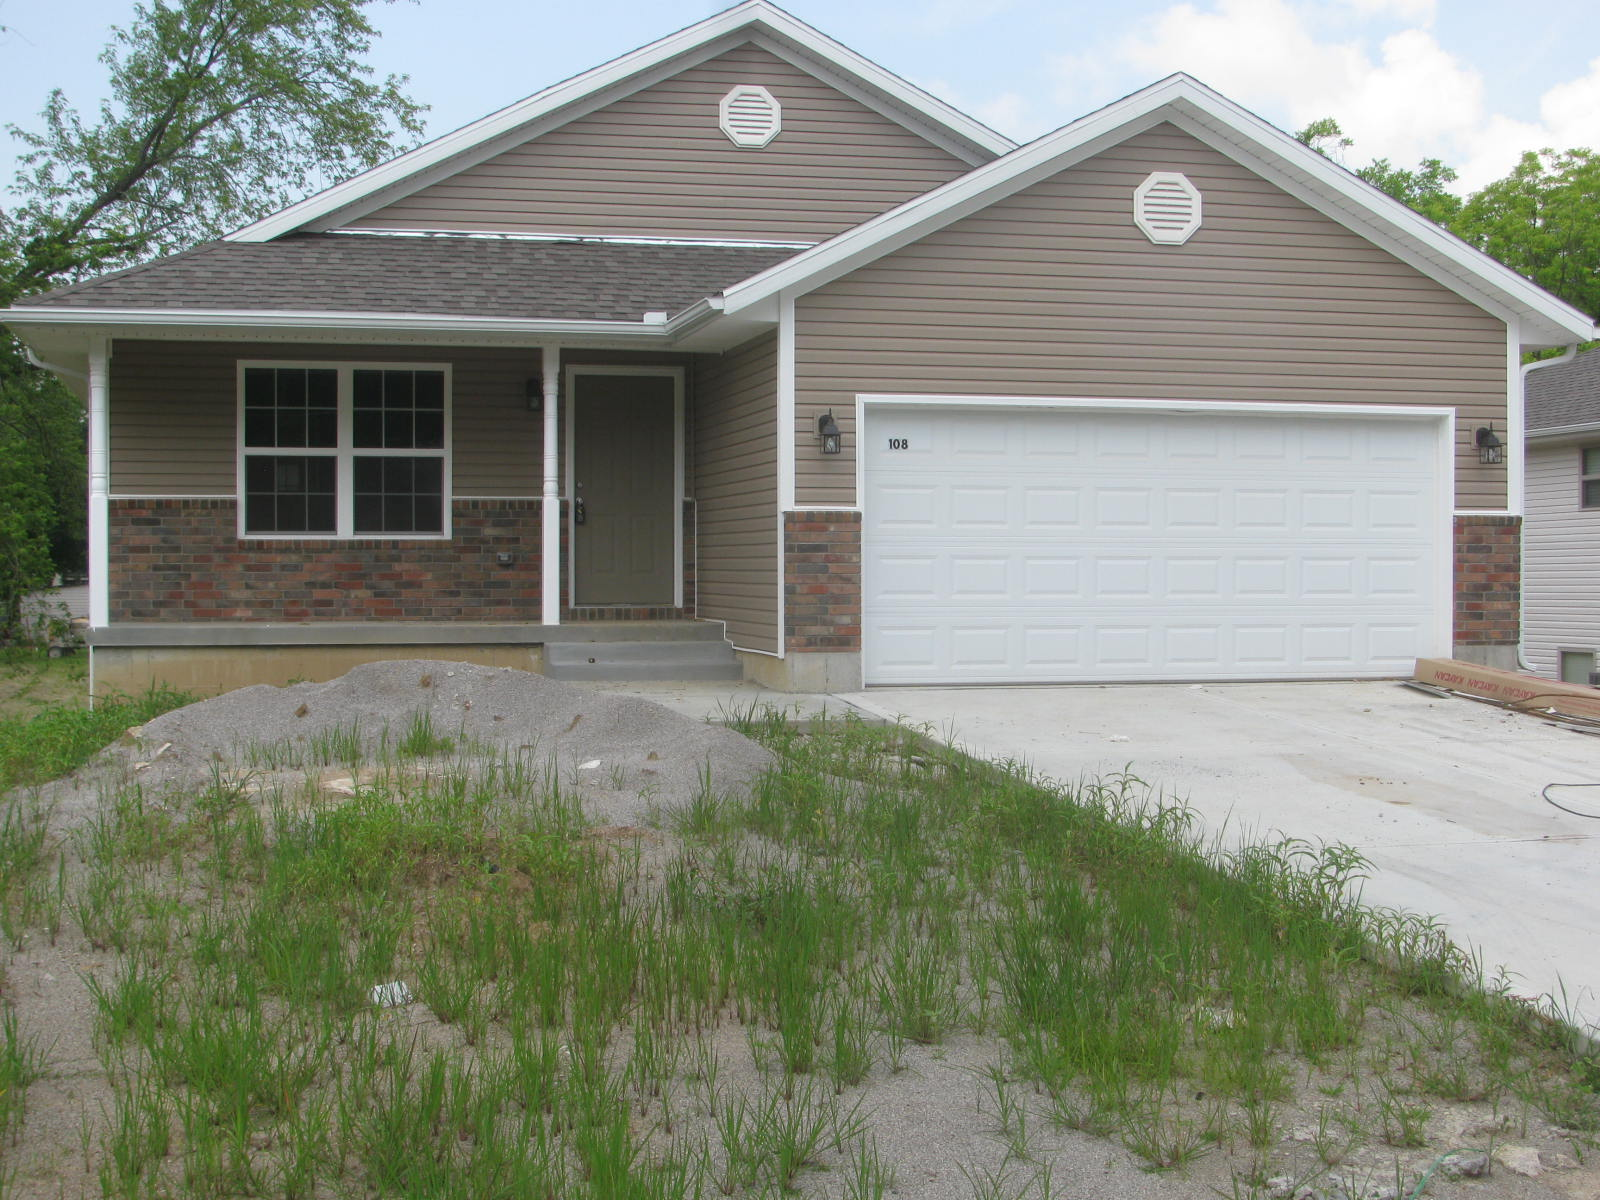 108 S Wright Street, Frontenac, Kansas 66763